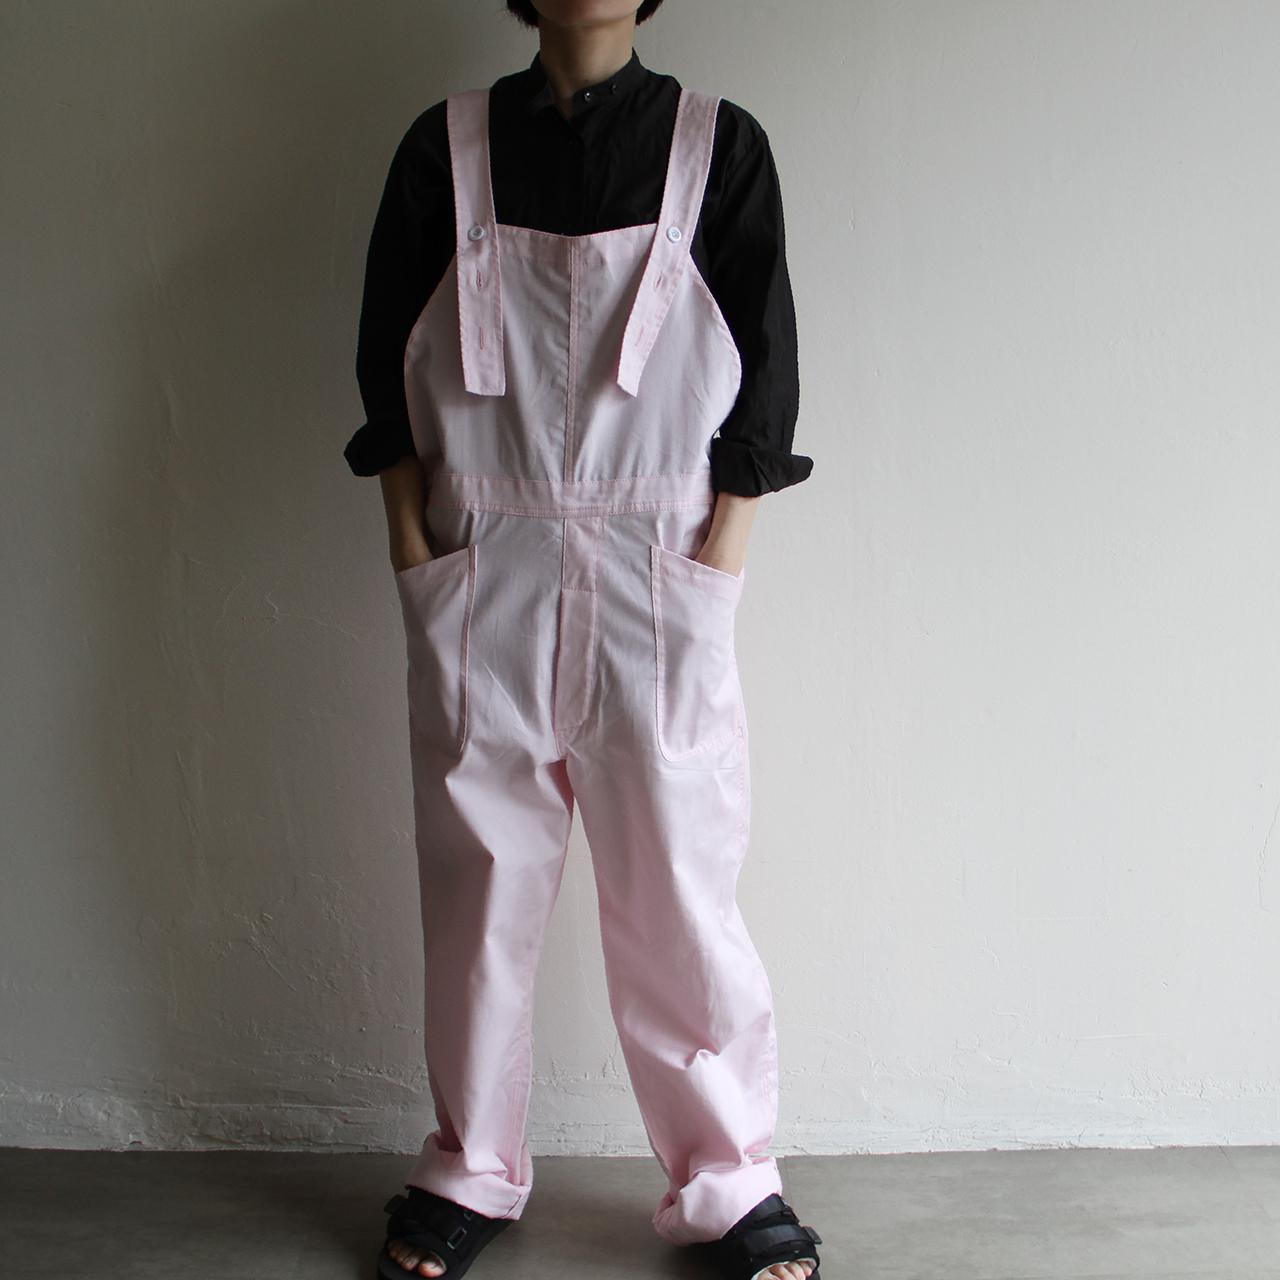 Yarmo【 womens 】bib and brace overall